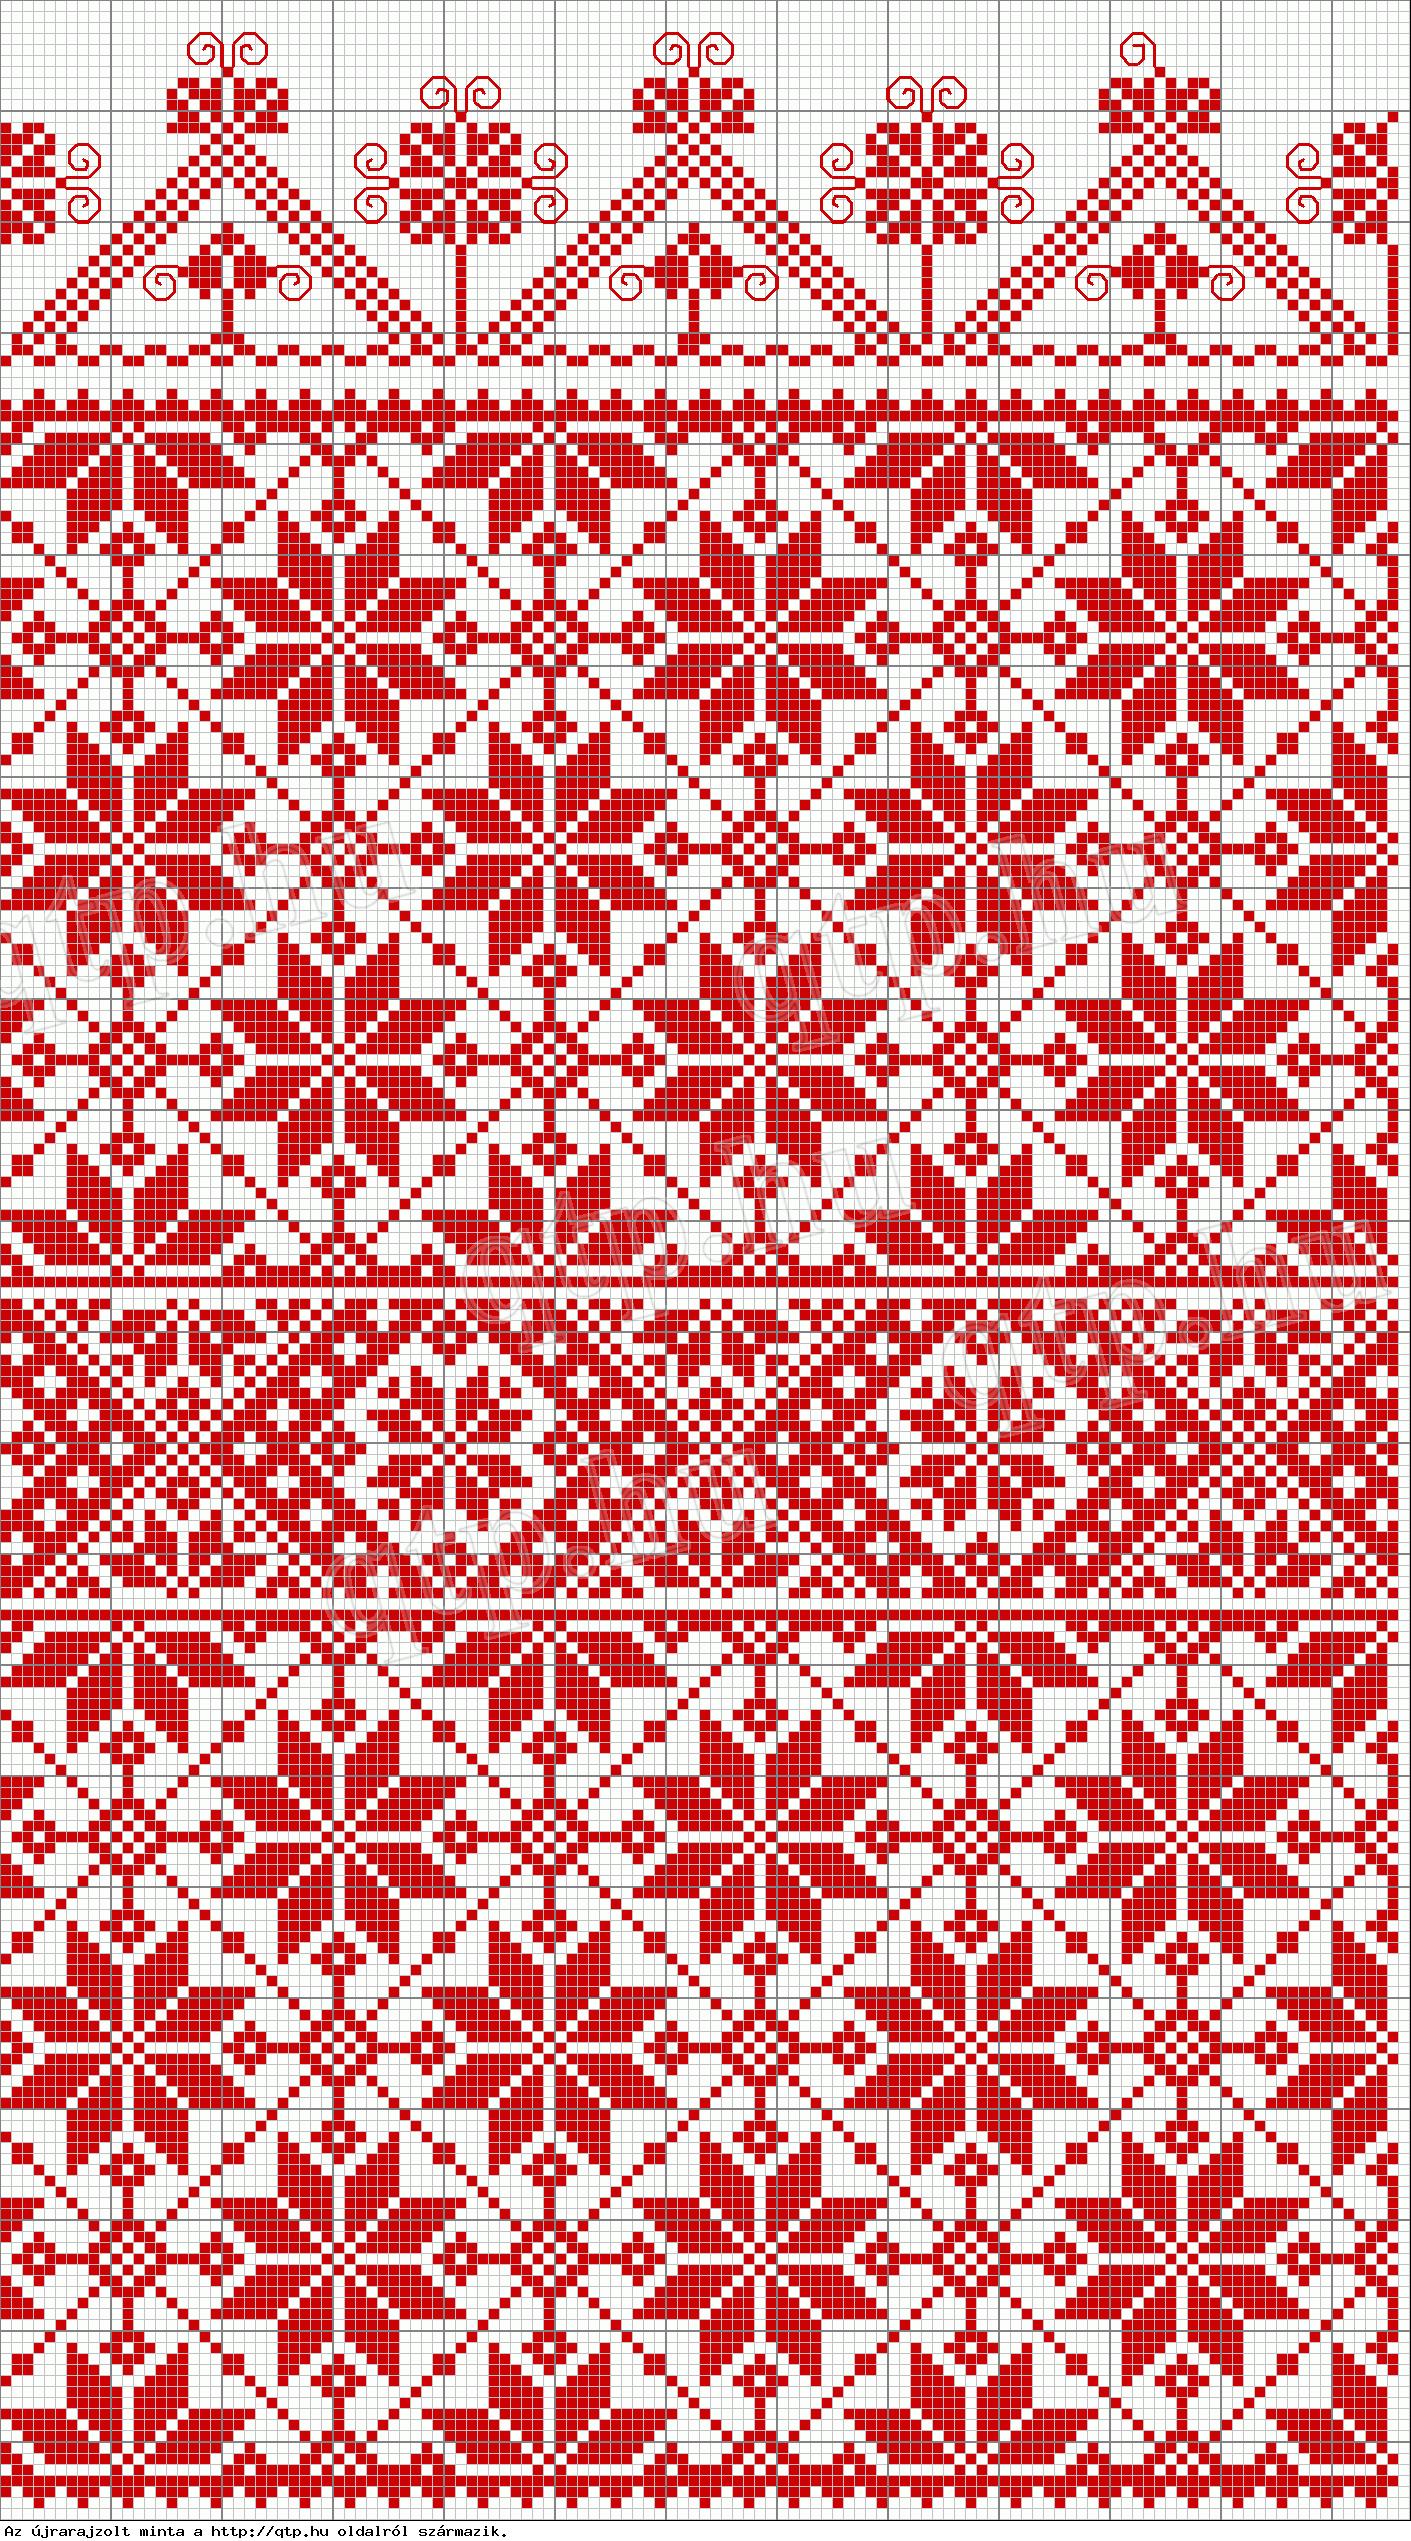 Rbakzi hmzsek blanket idea free knit chart fair isle knitting patterns rbakzi hmzsek blanket idea free knit chart fair isle bankloansurffo Gallery